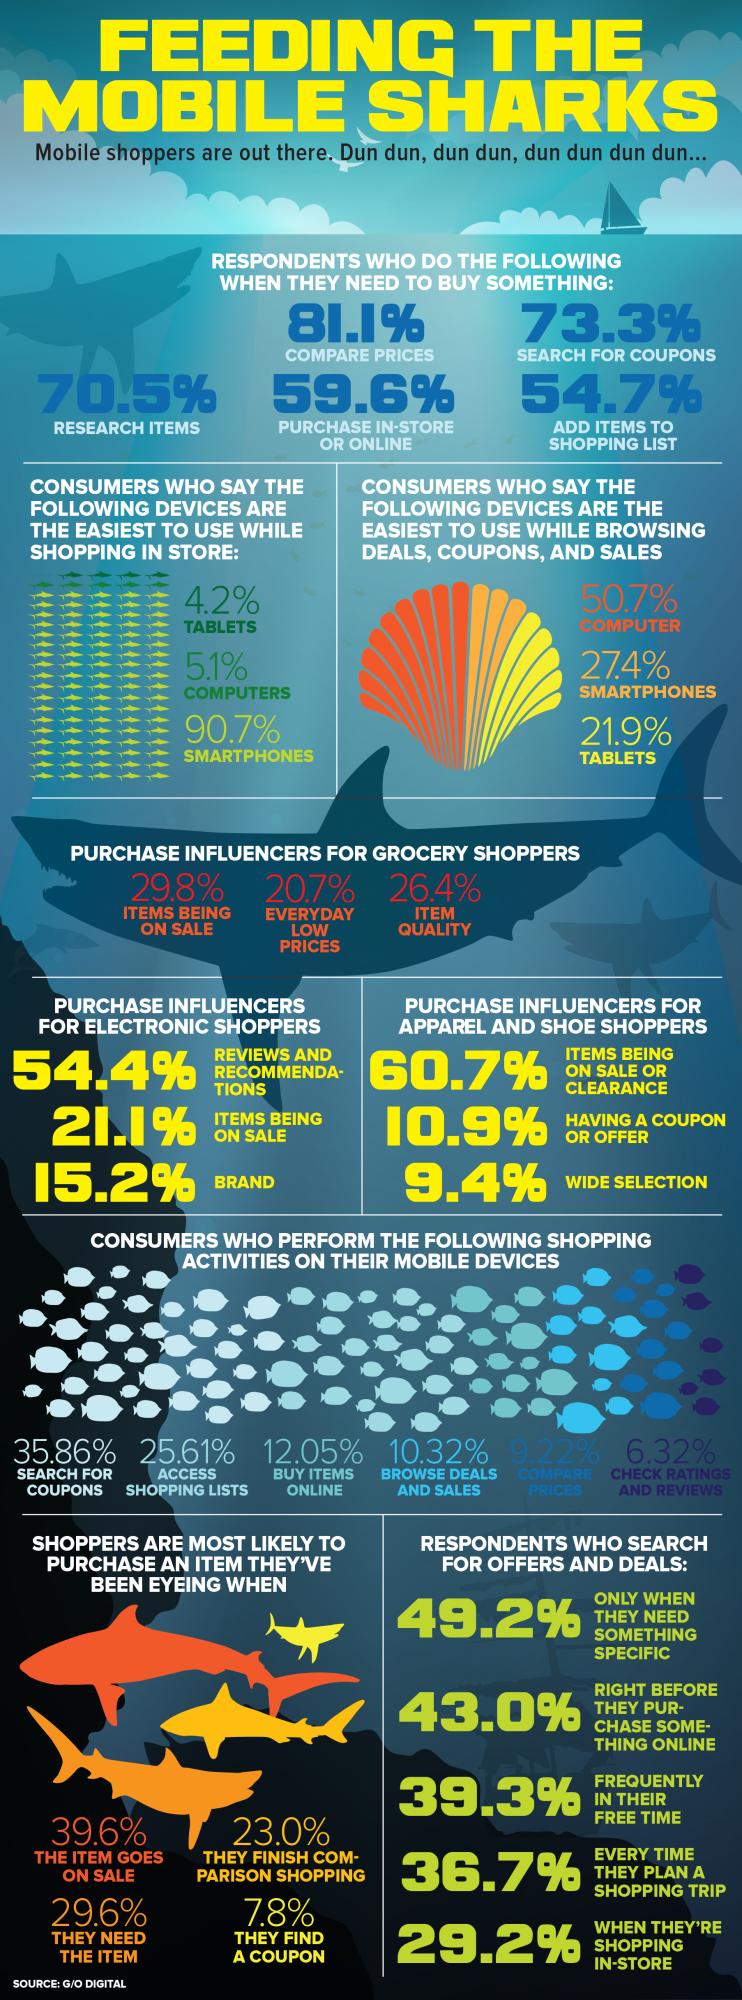 Feedingthemobilesharks.infographic